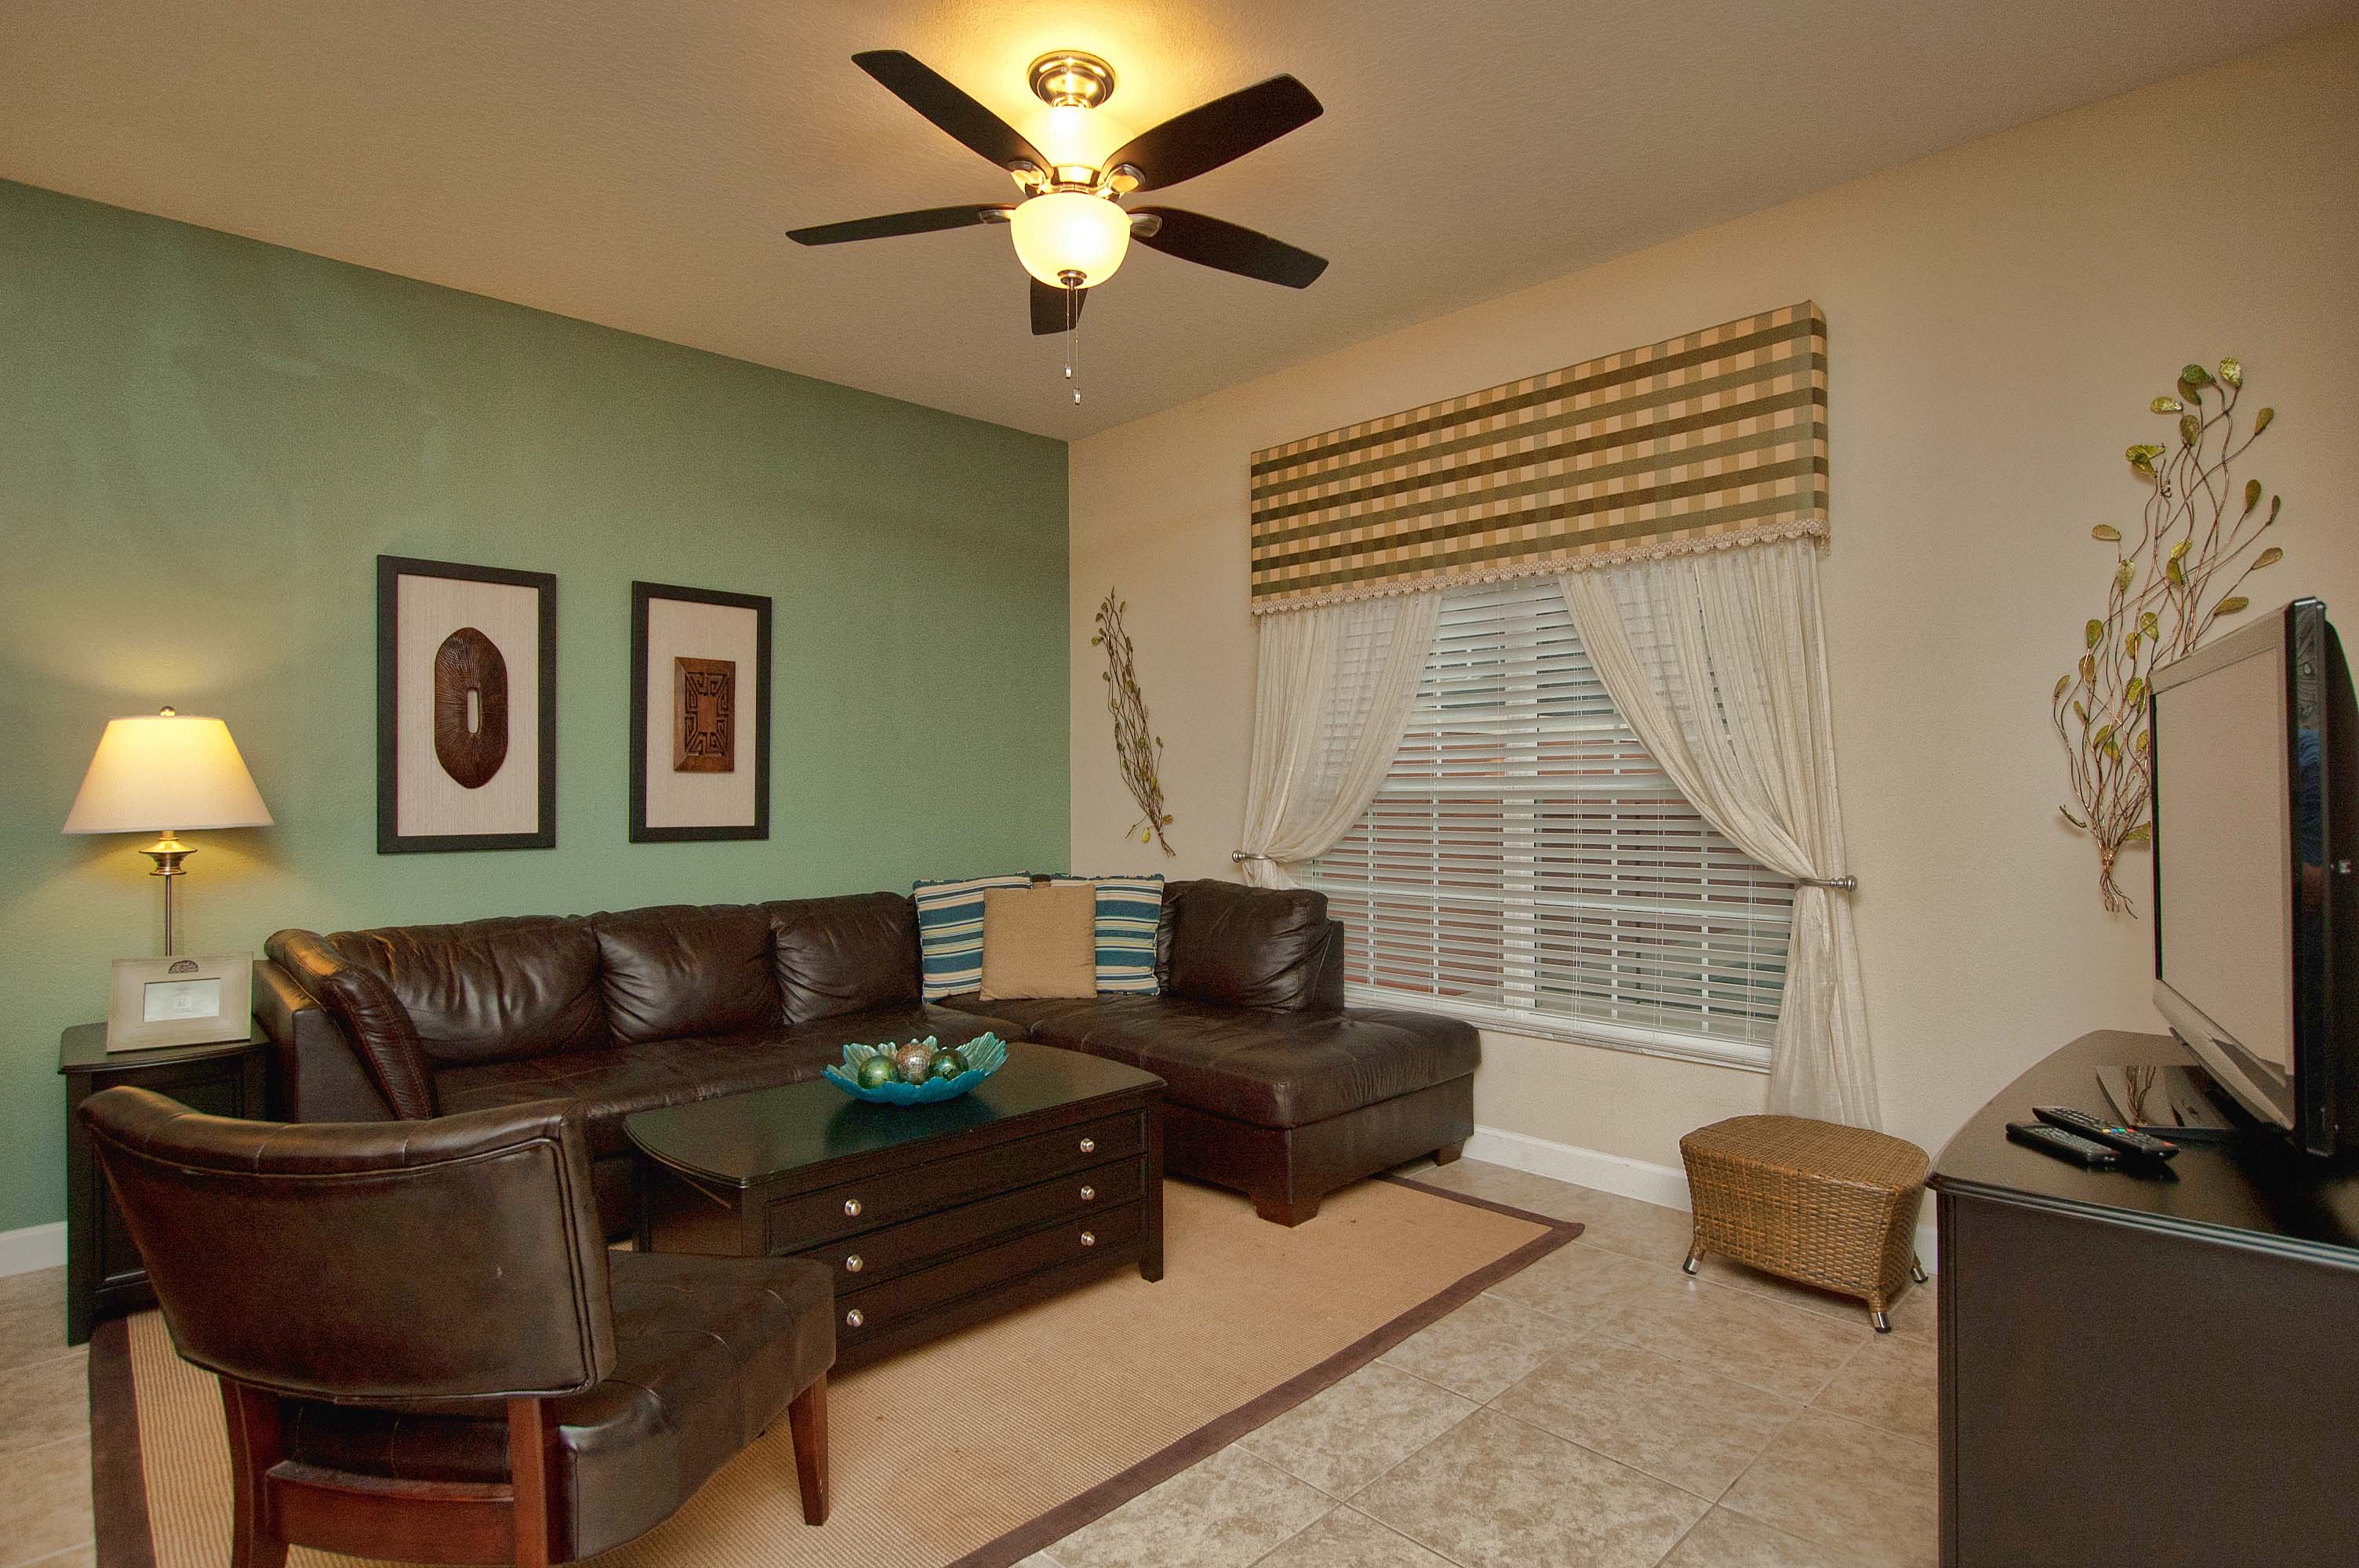 4 Bed Short Term Rental House Paradise Palms